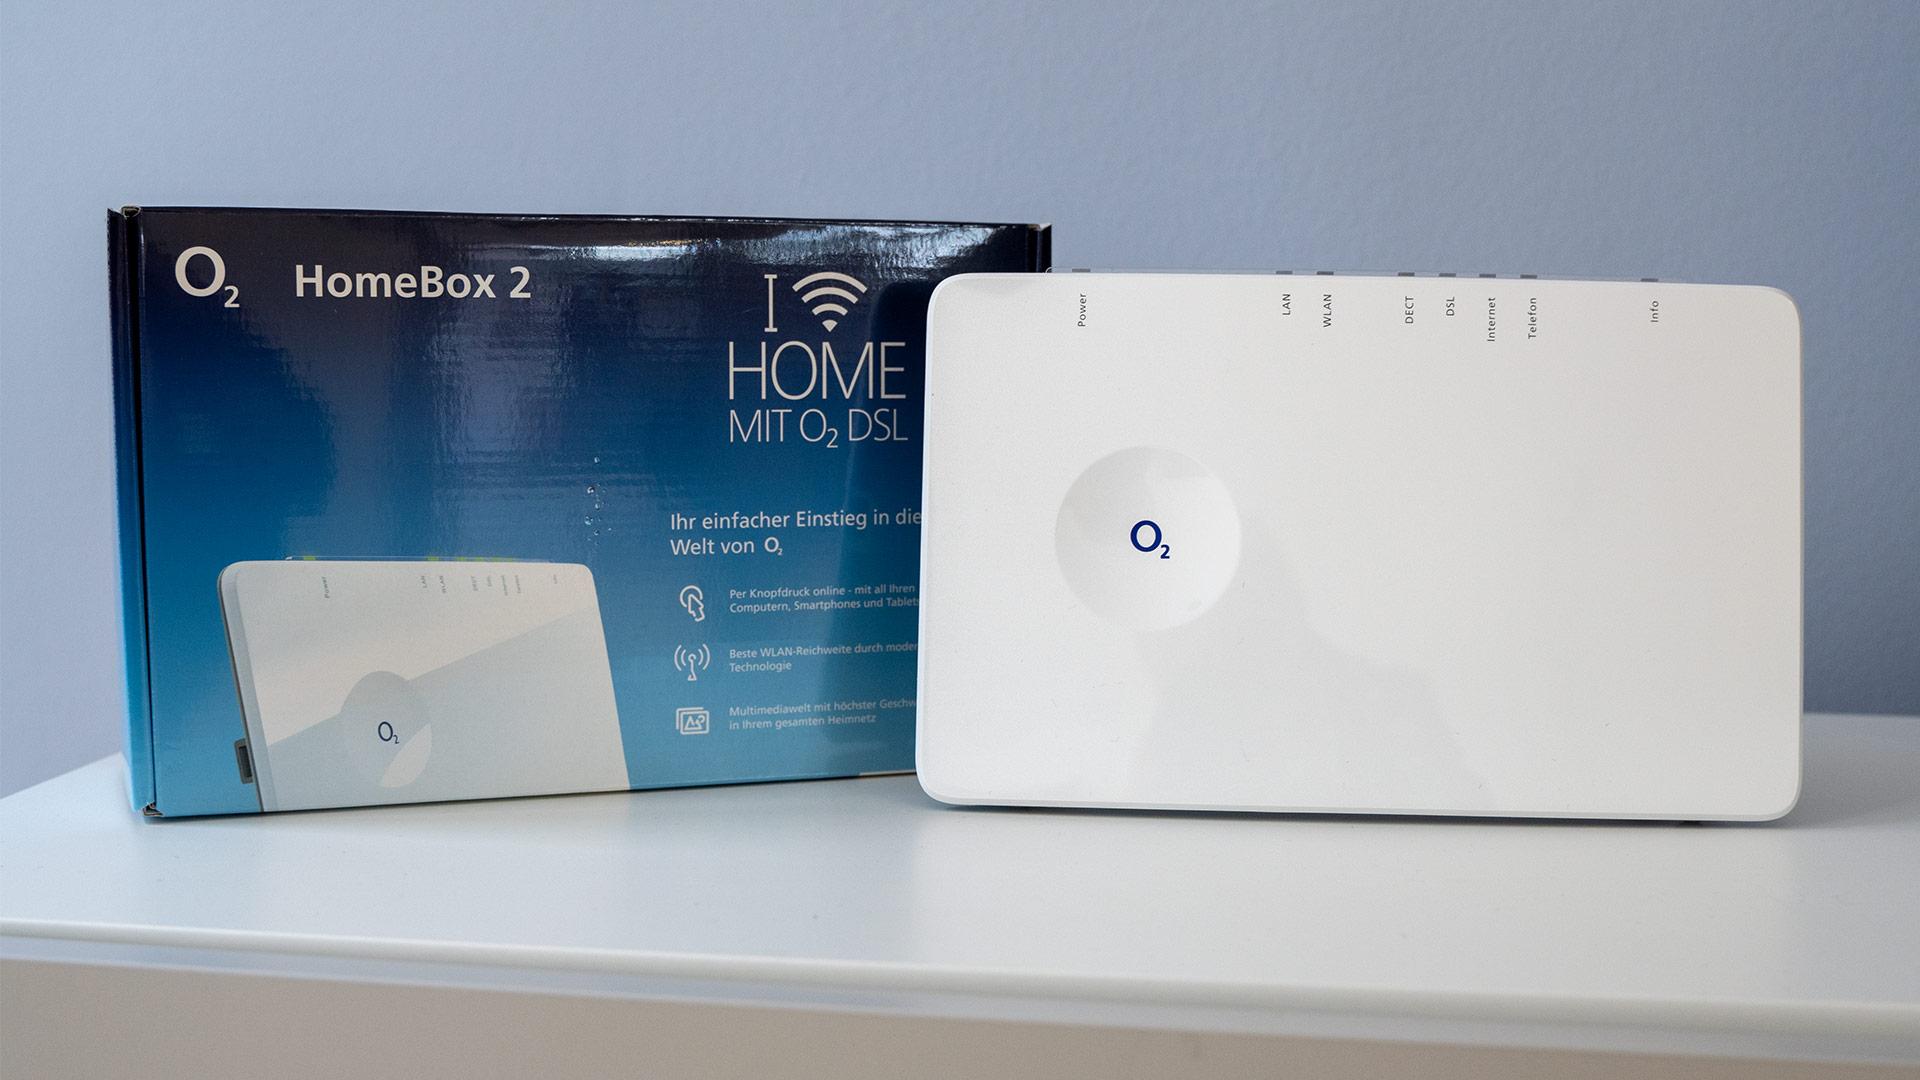 o2 HomeBox 2 mit Verpackung